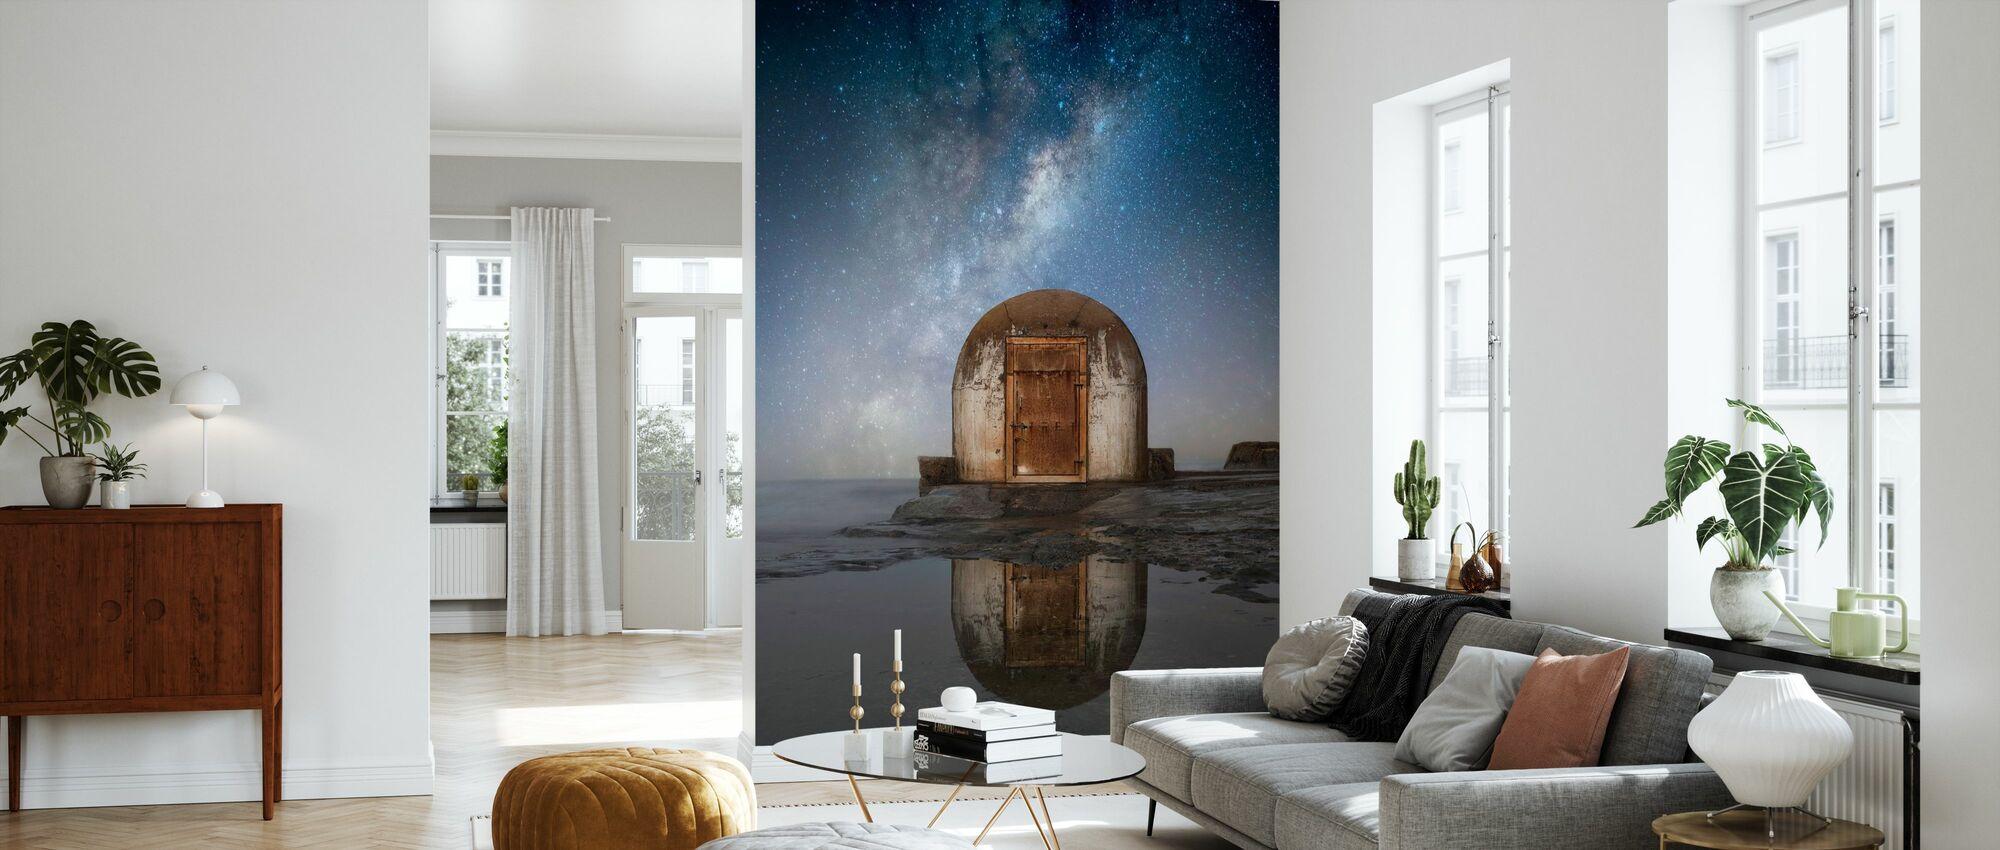 Lonely Hut - Wallpaper - Living Room